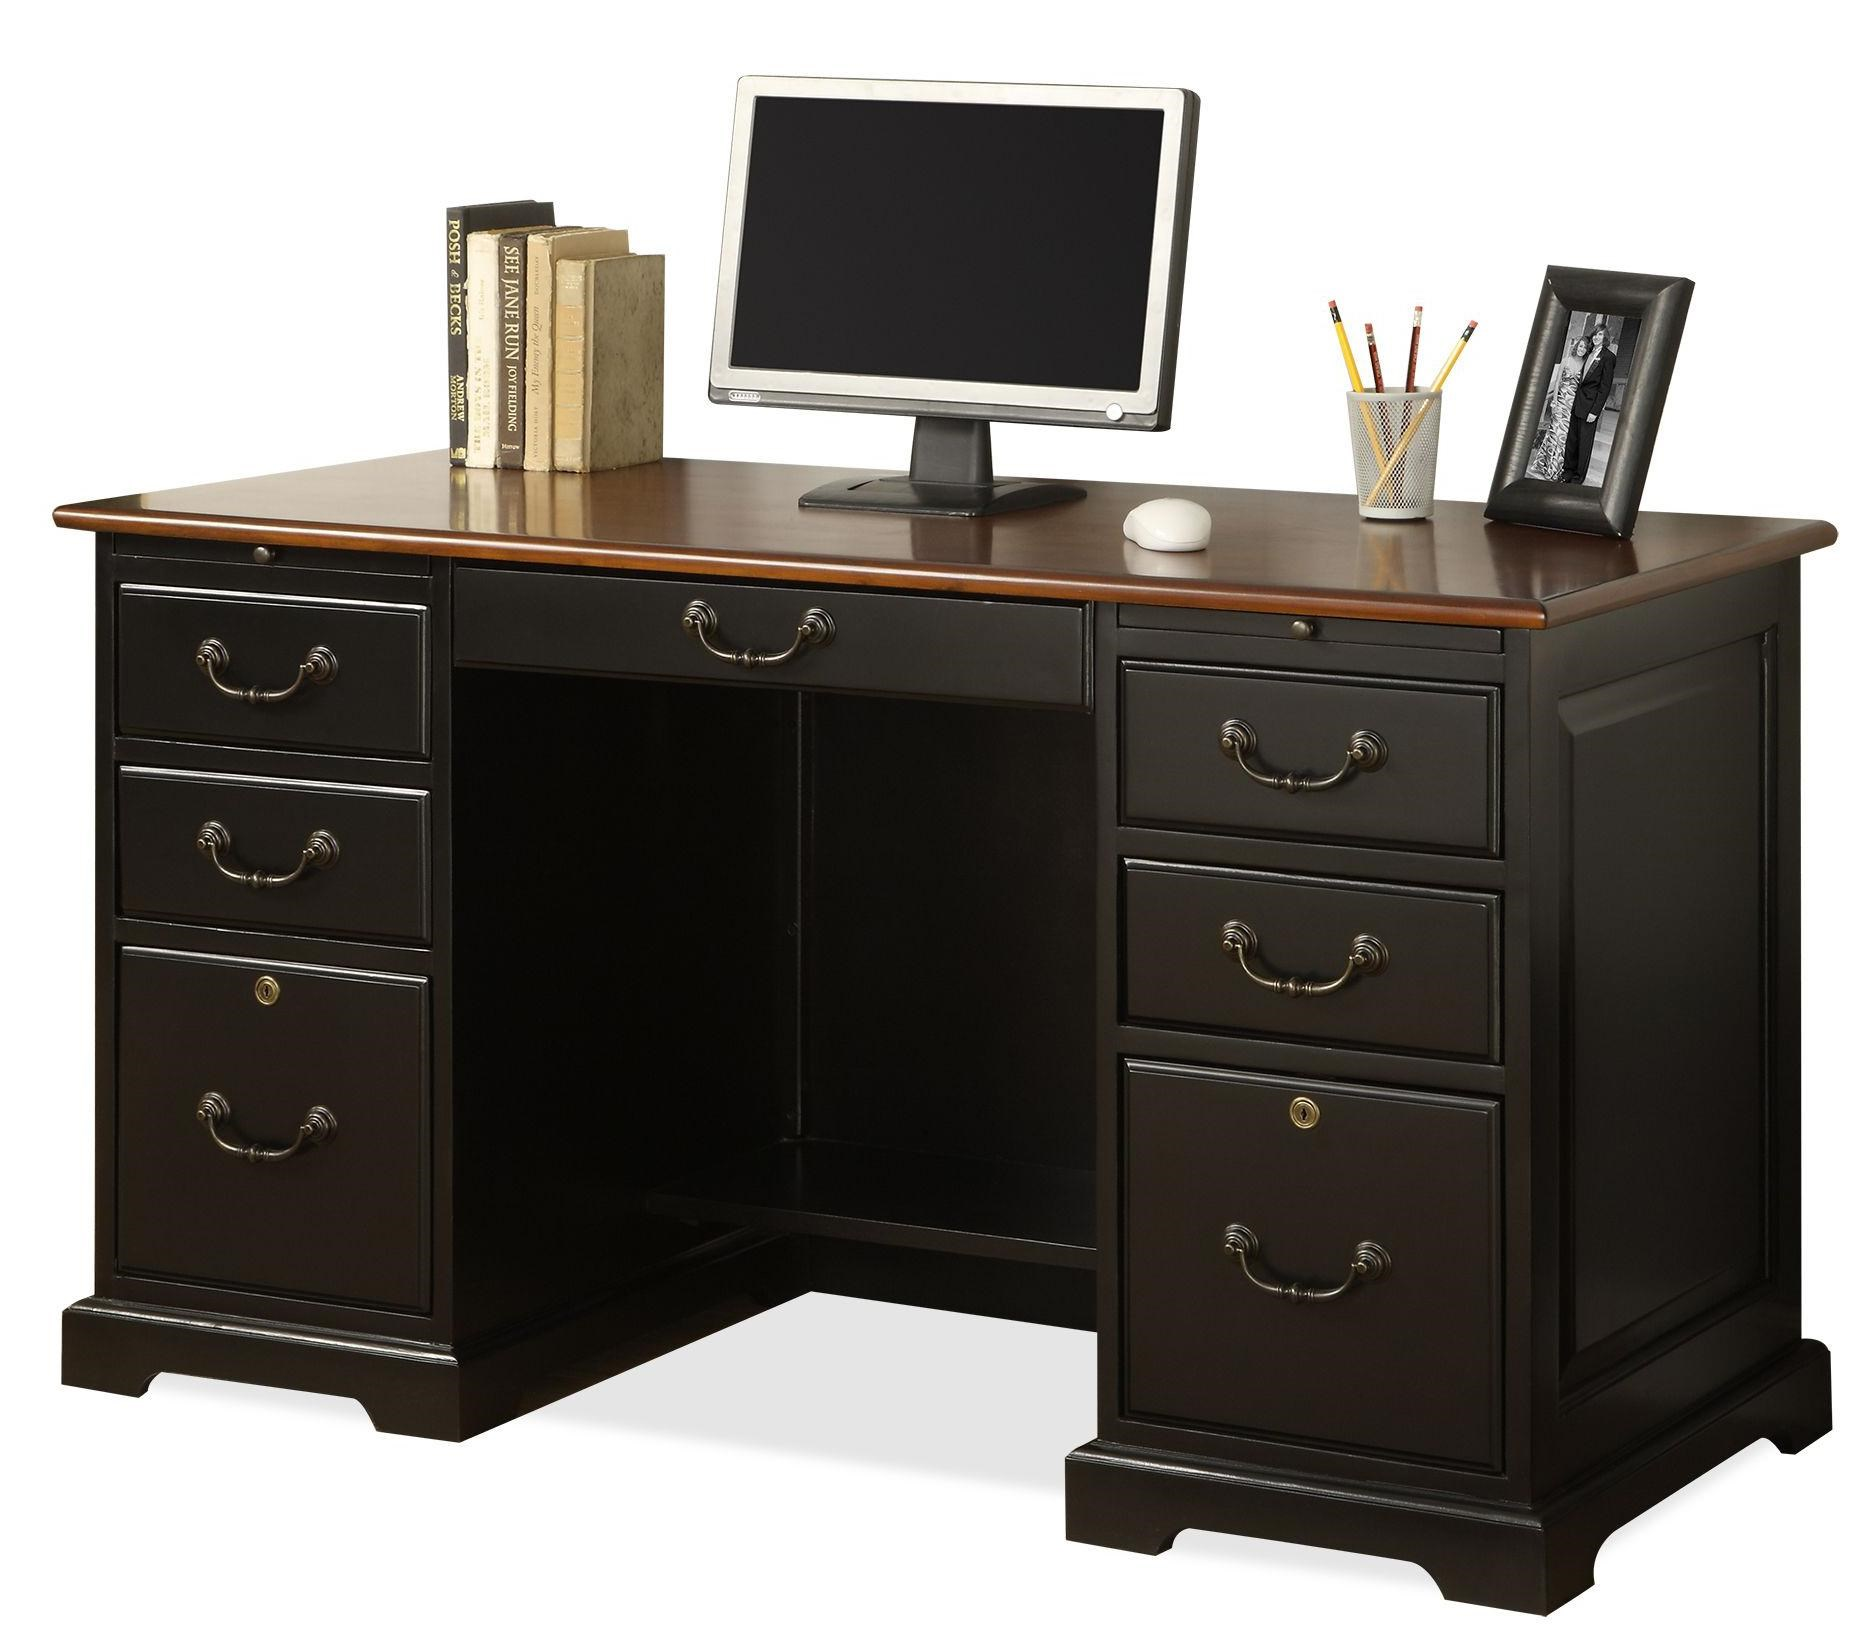 Riverside Furniture Bridgeport 54 Inch Double Pedestal